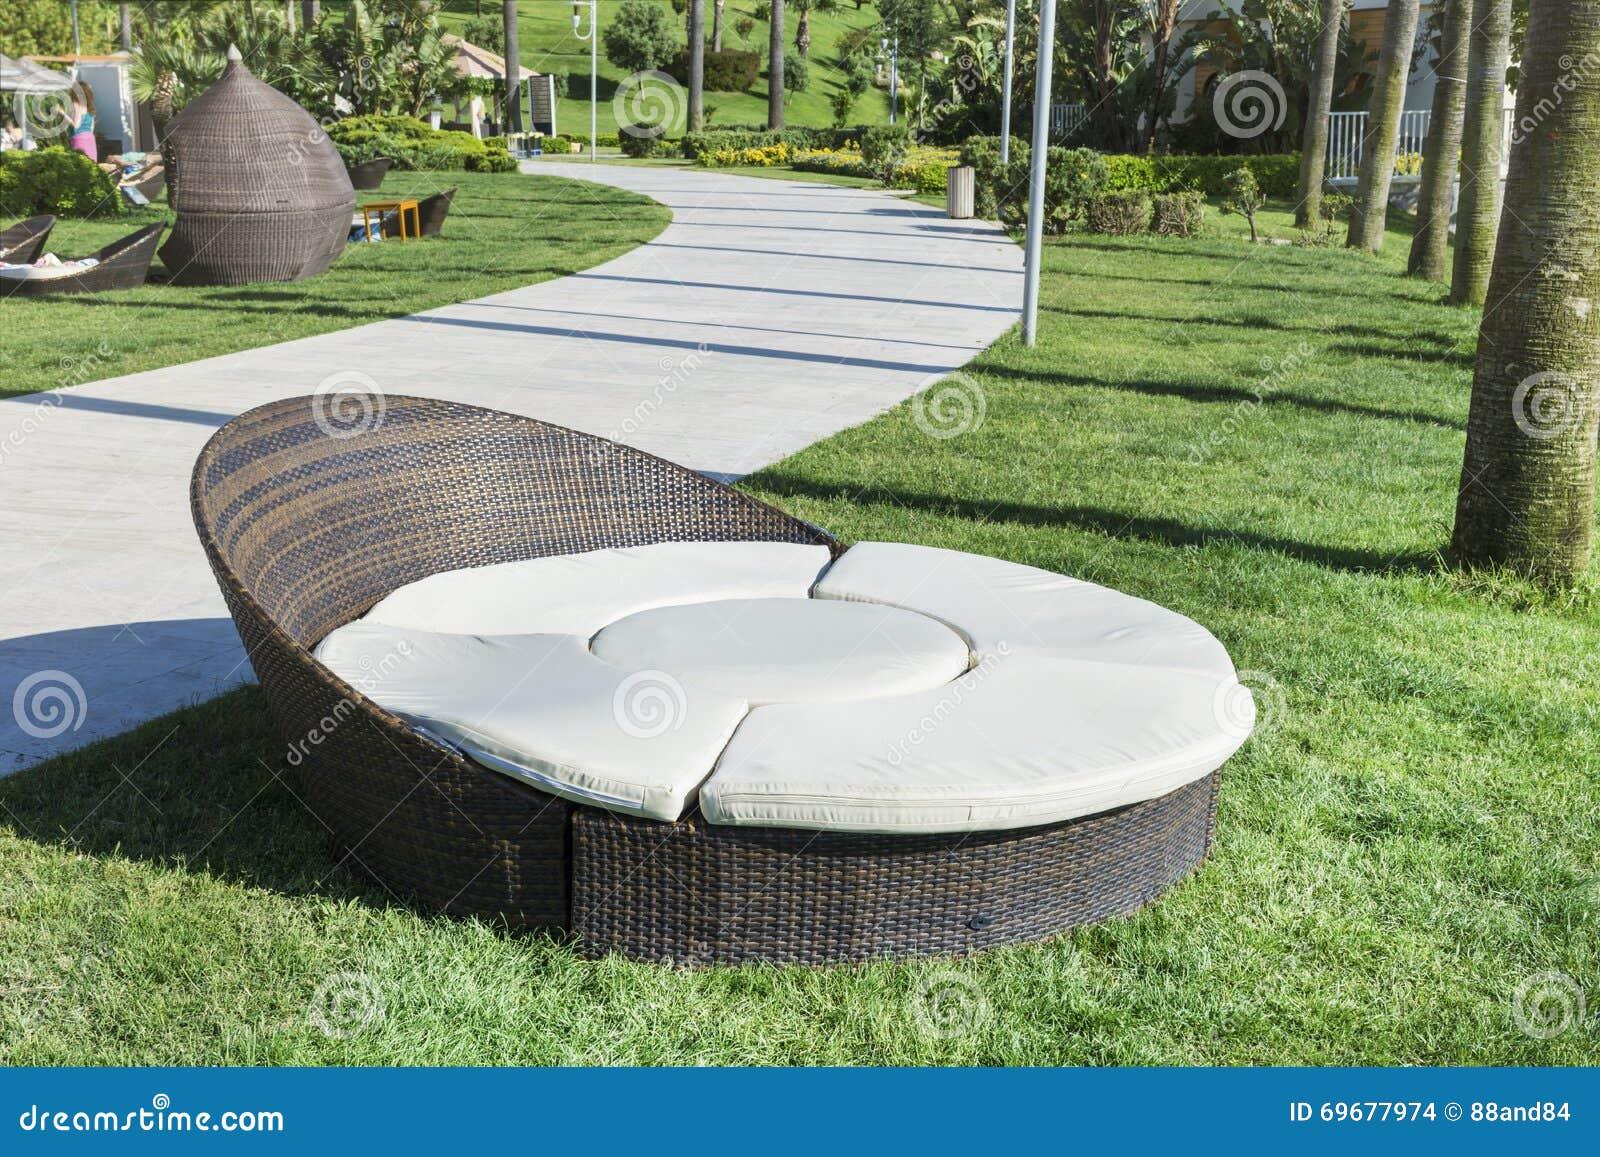 Lit Pliant De Rotin De Salon Dans Un Jardin Vert Photo stock - Image ...